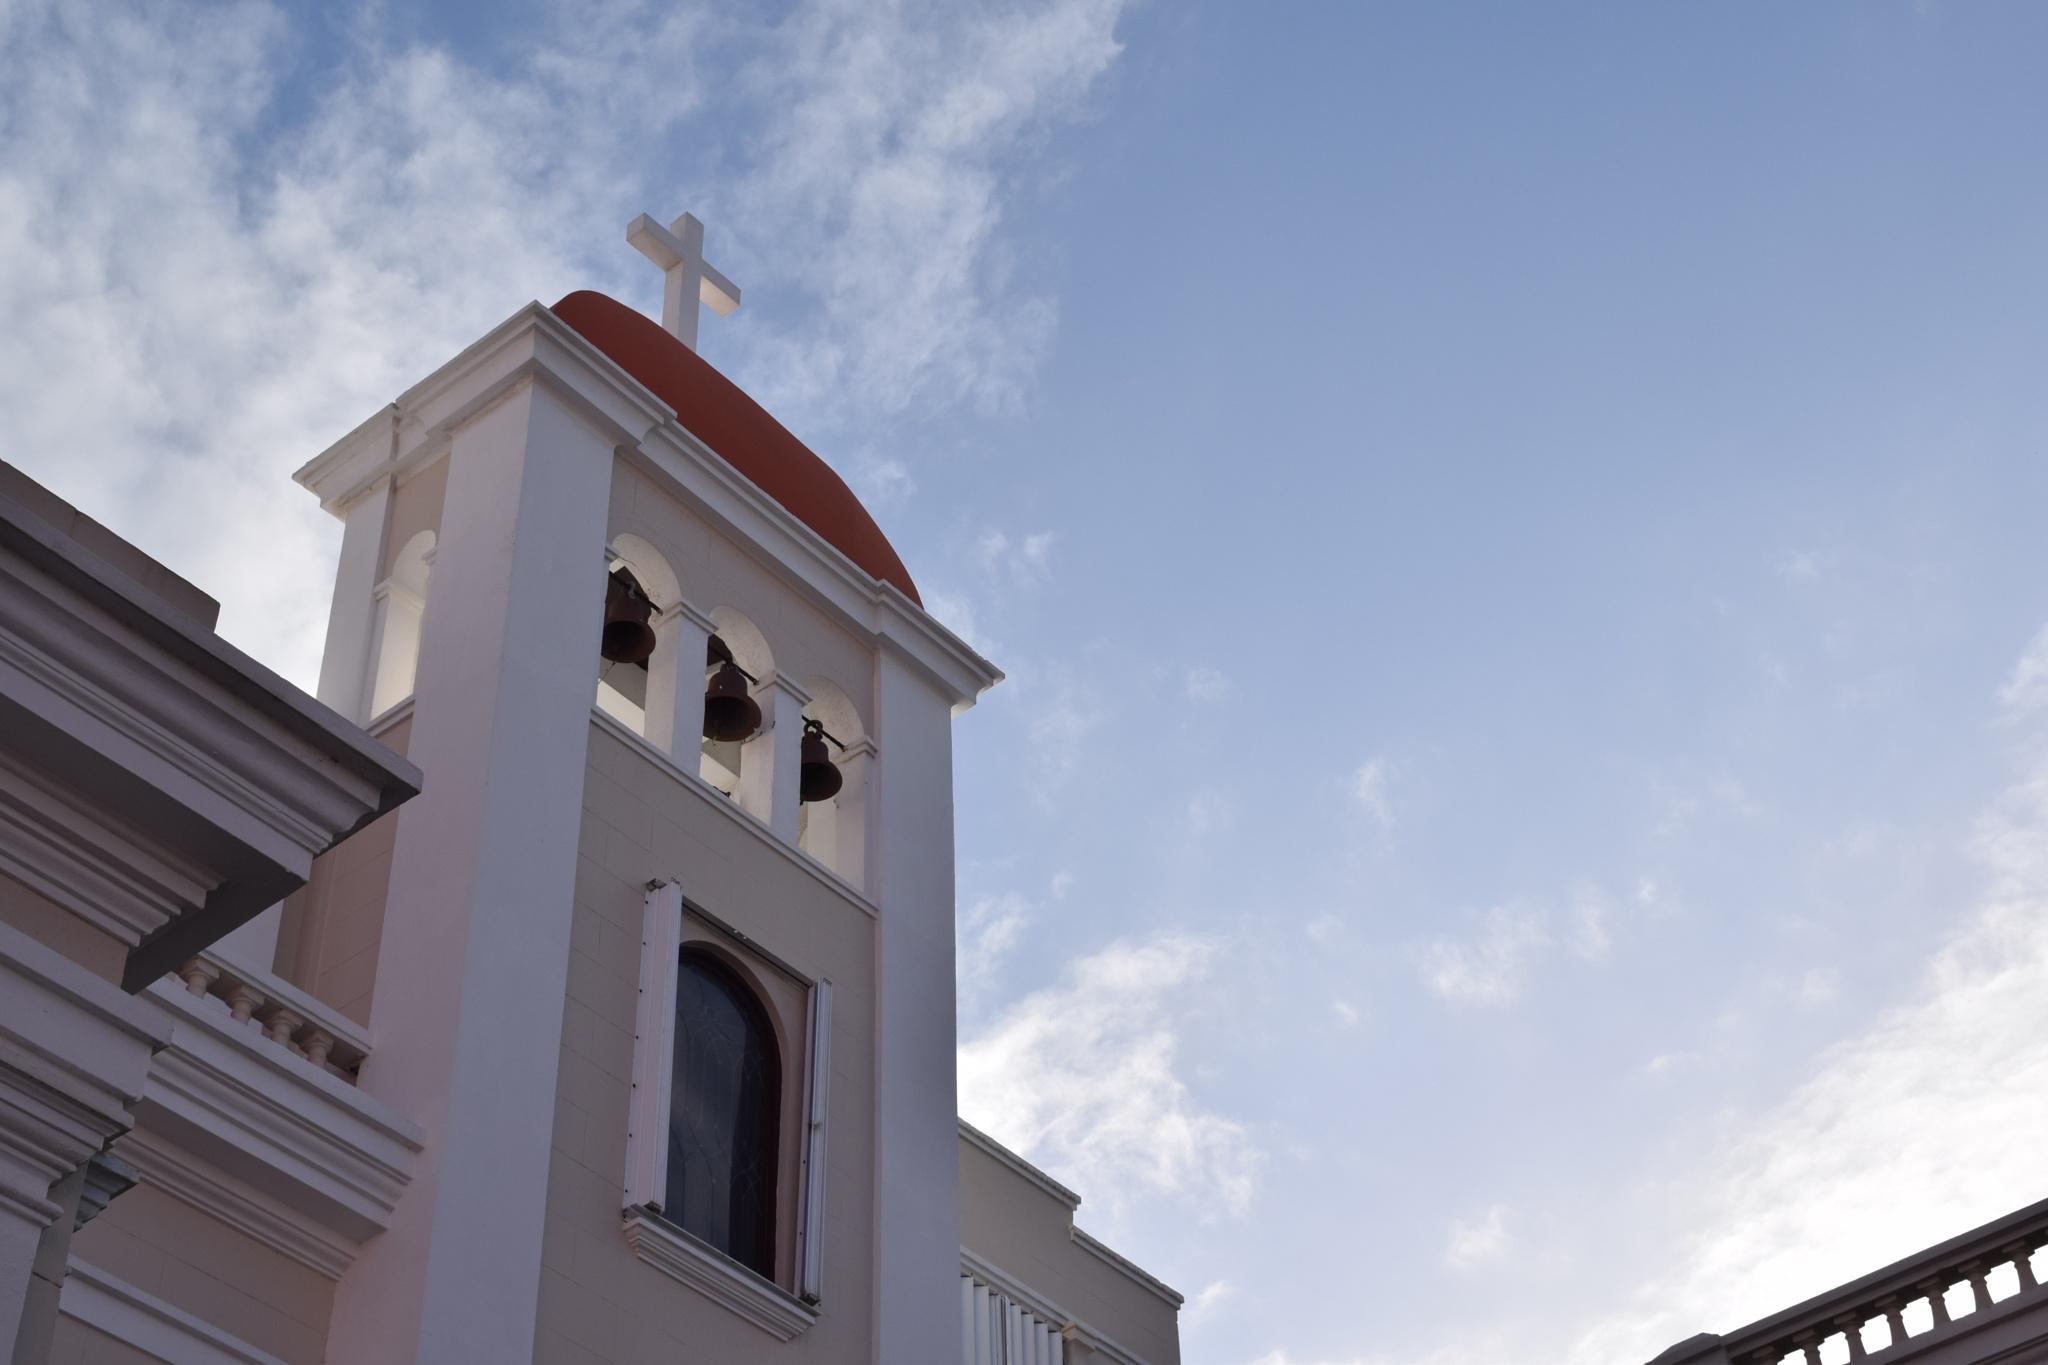 Church of Siervas de María by bayaneypr